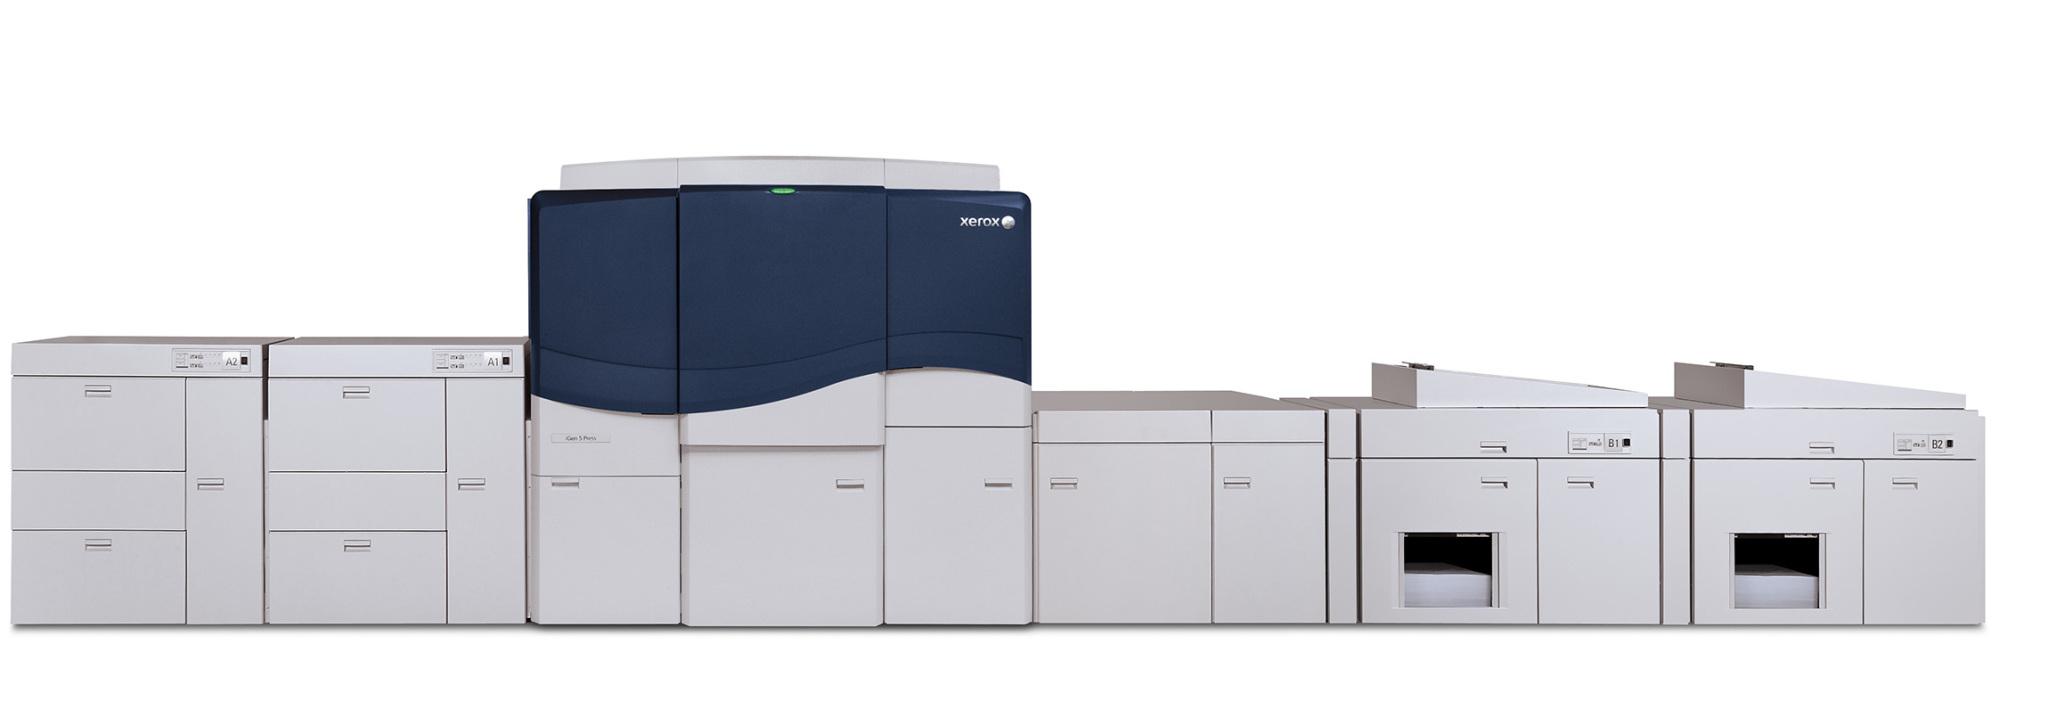 Xerox Xerox iGen 5 Press available at XCel Office Solutions of Oklahoma